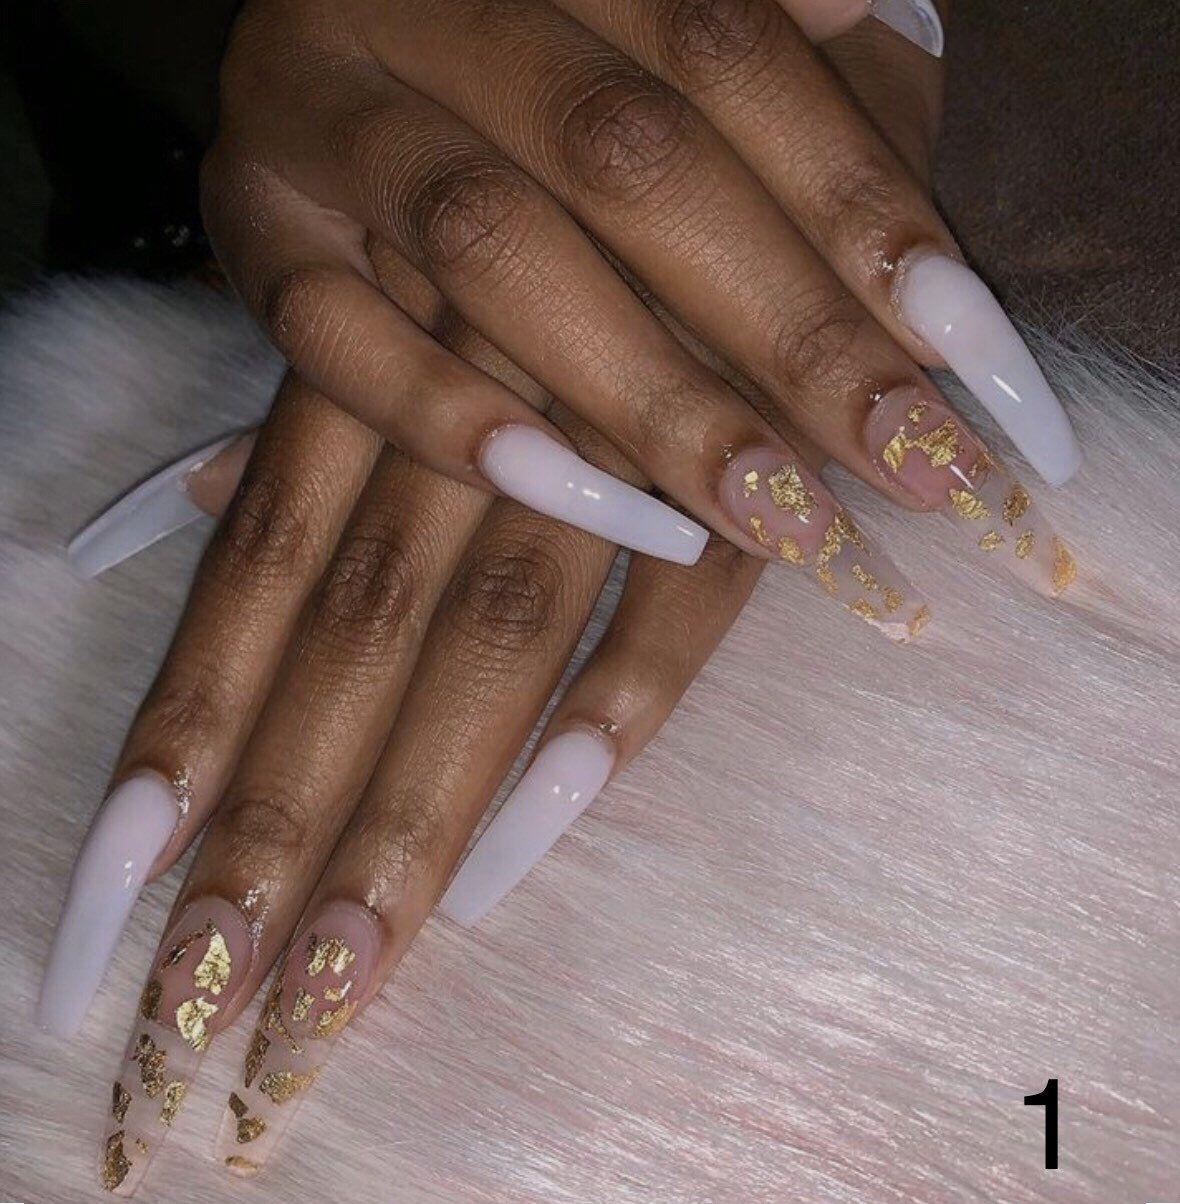 Custom Press On Acrylic Nails Set Of 10 Any Size Shape Etsy Acrylic Nail Set Coffin Nails Designs Fake Nails